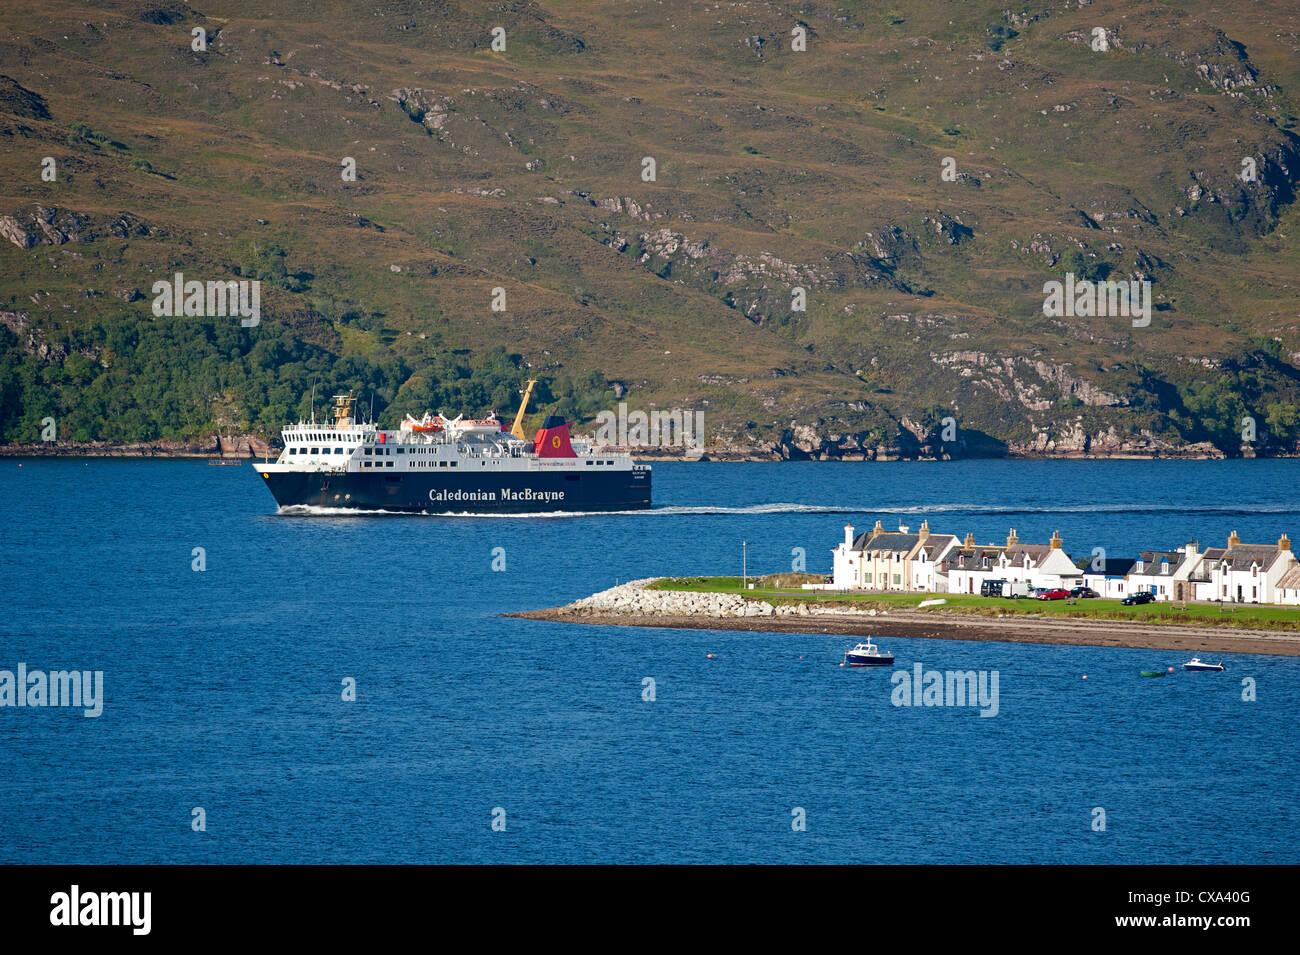 Ullapool, fishing and tourist ferry port on Loch Broom, Wester Ross Highland Region Scotland.  SCO 8529 - Stock Image